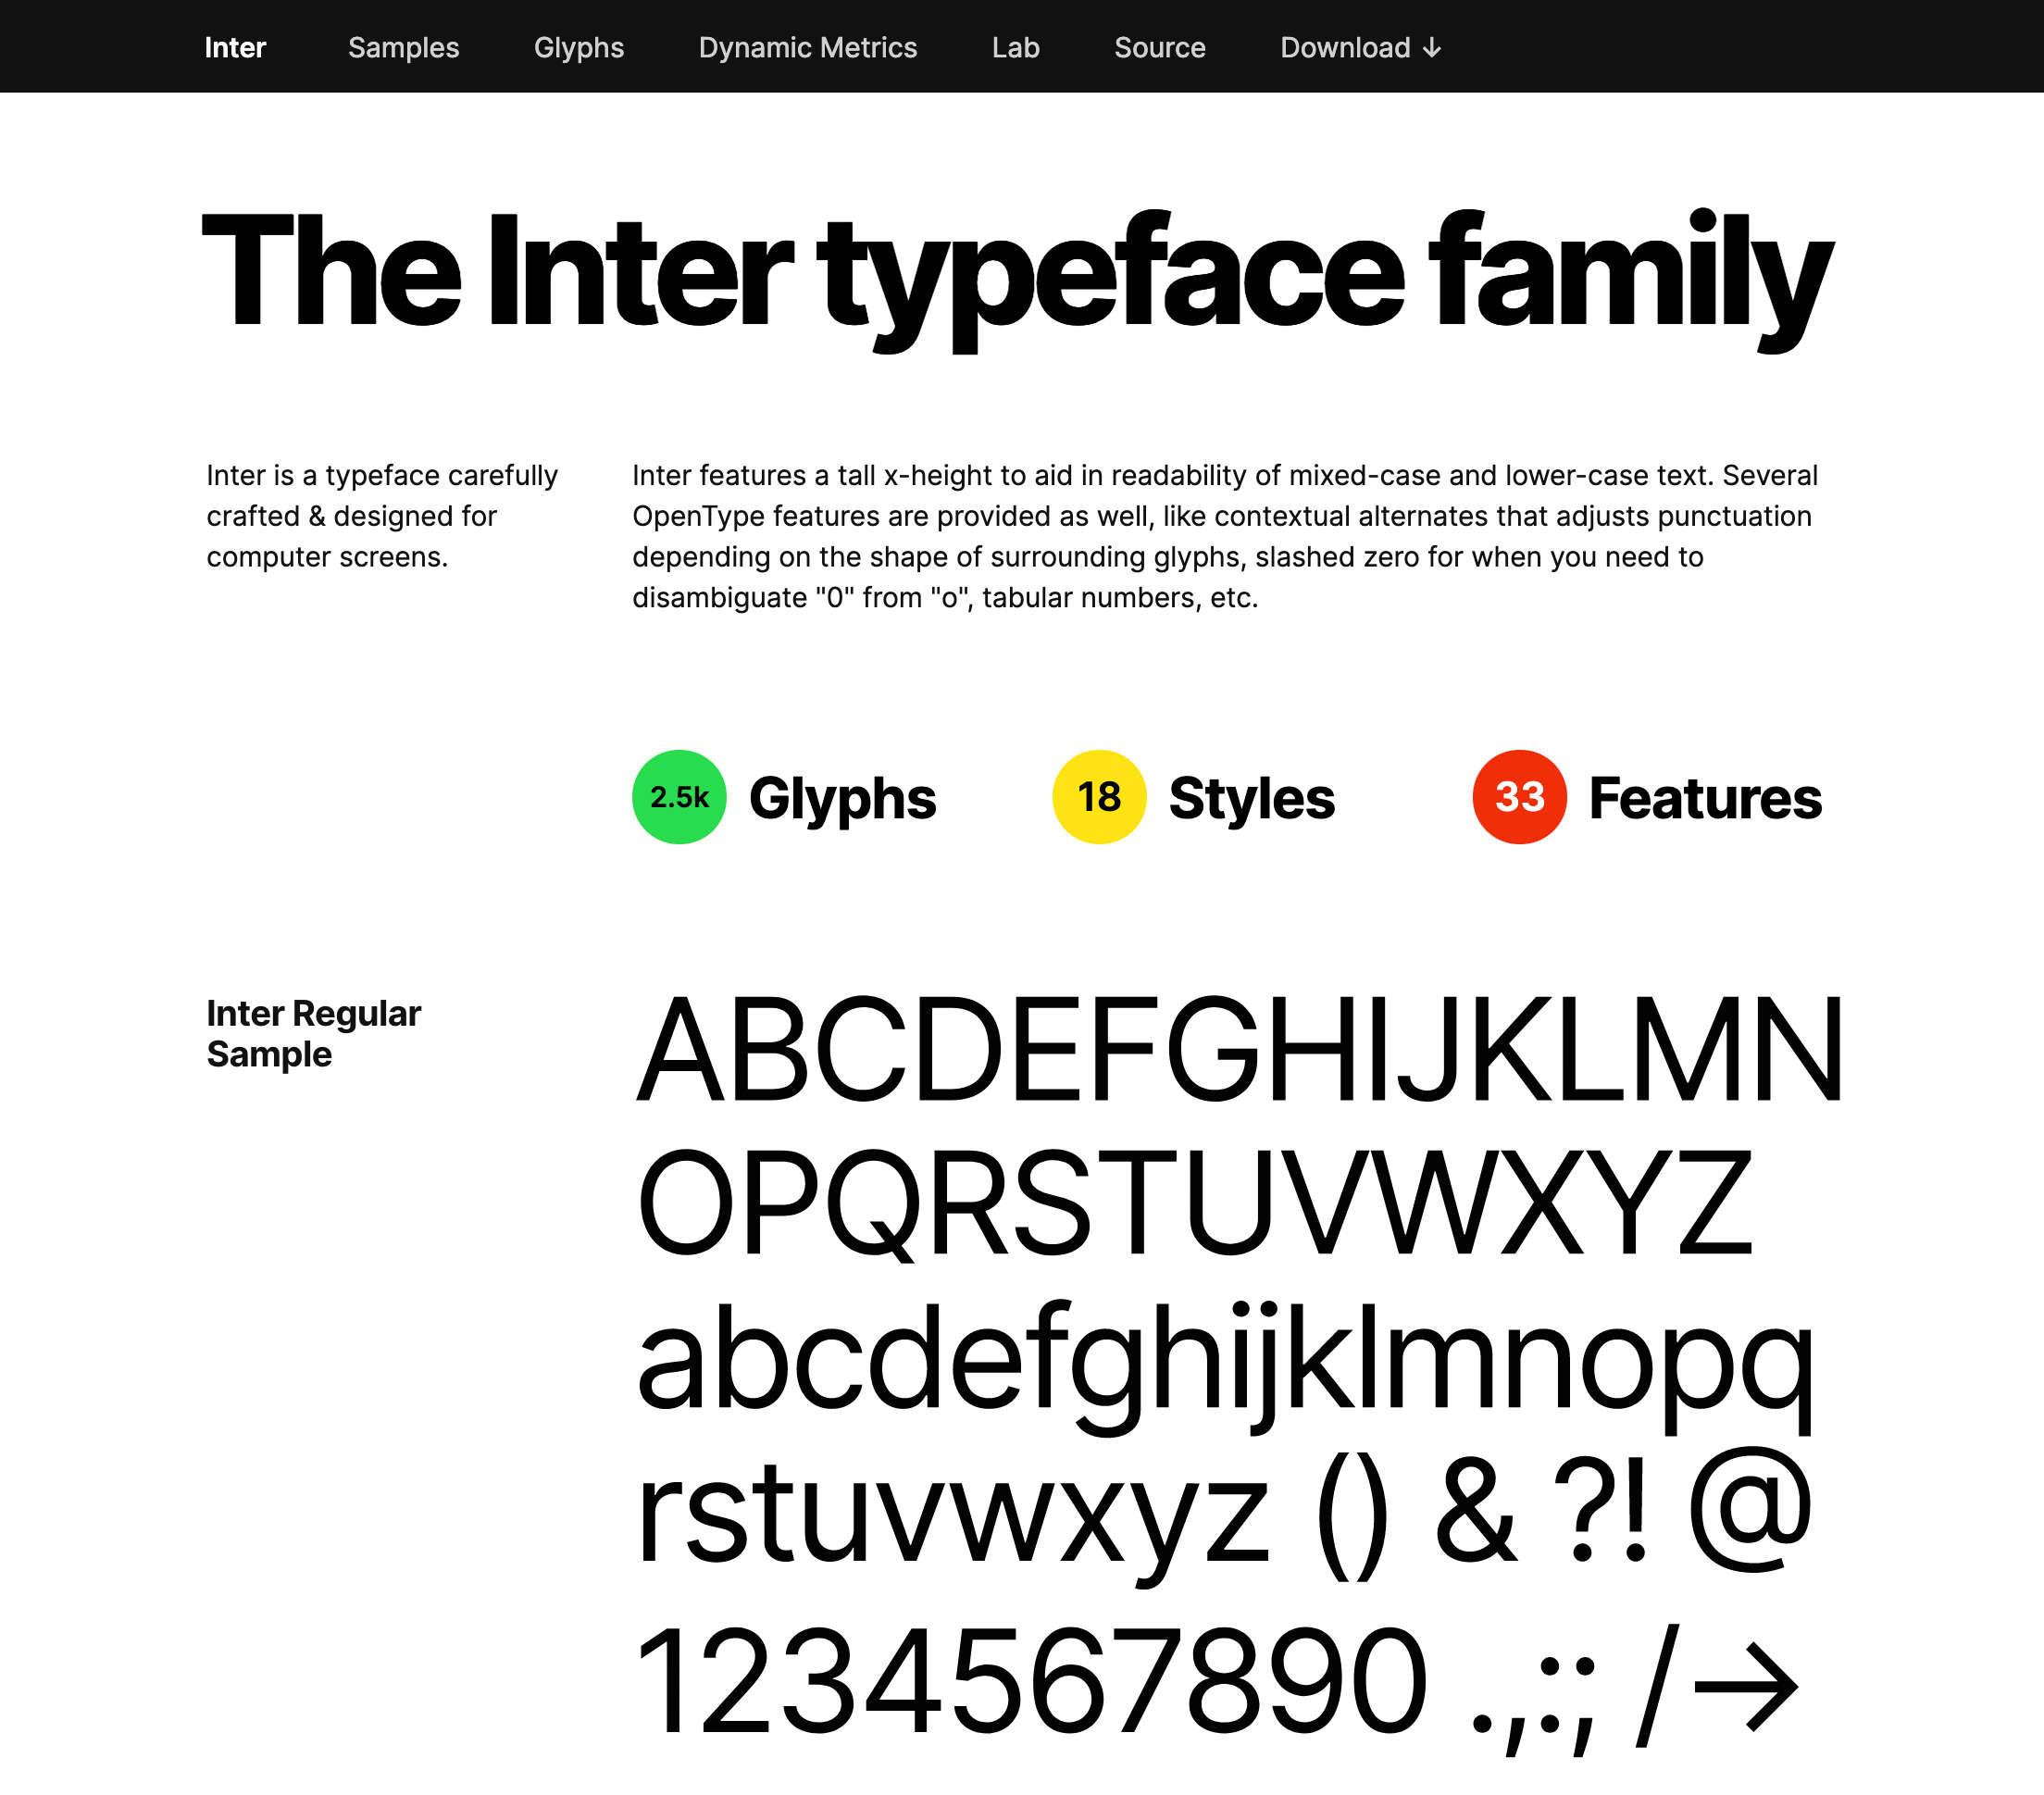 Inter typeface